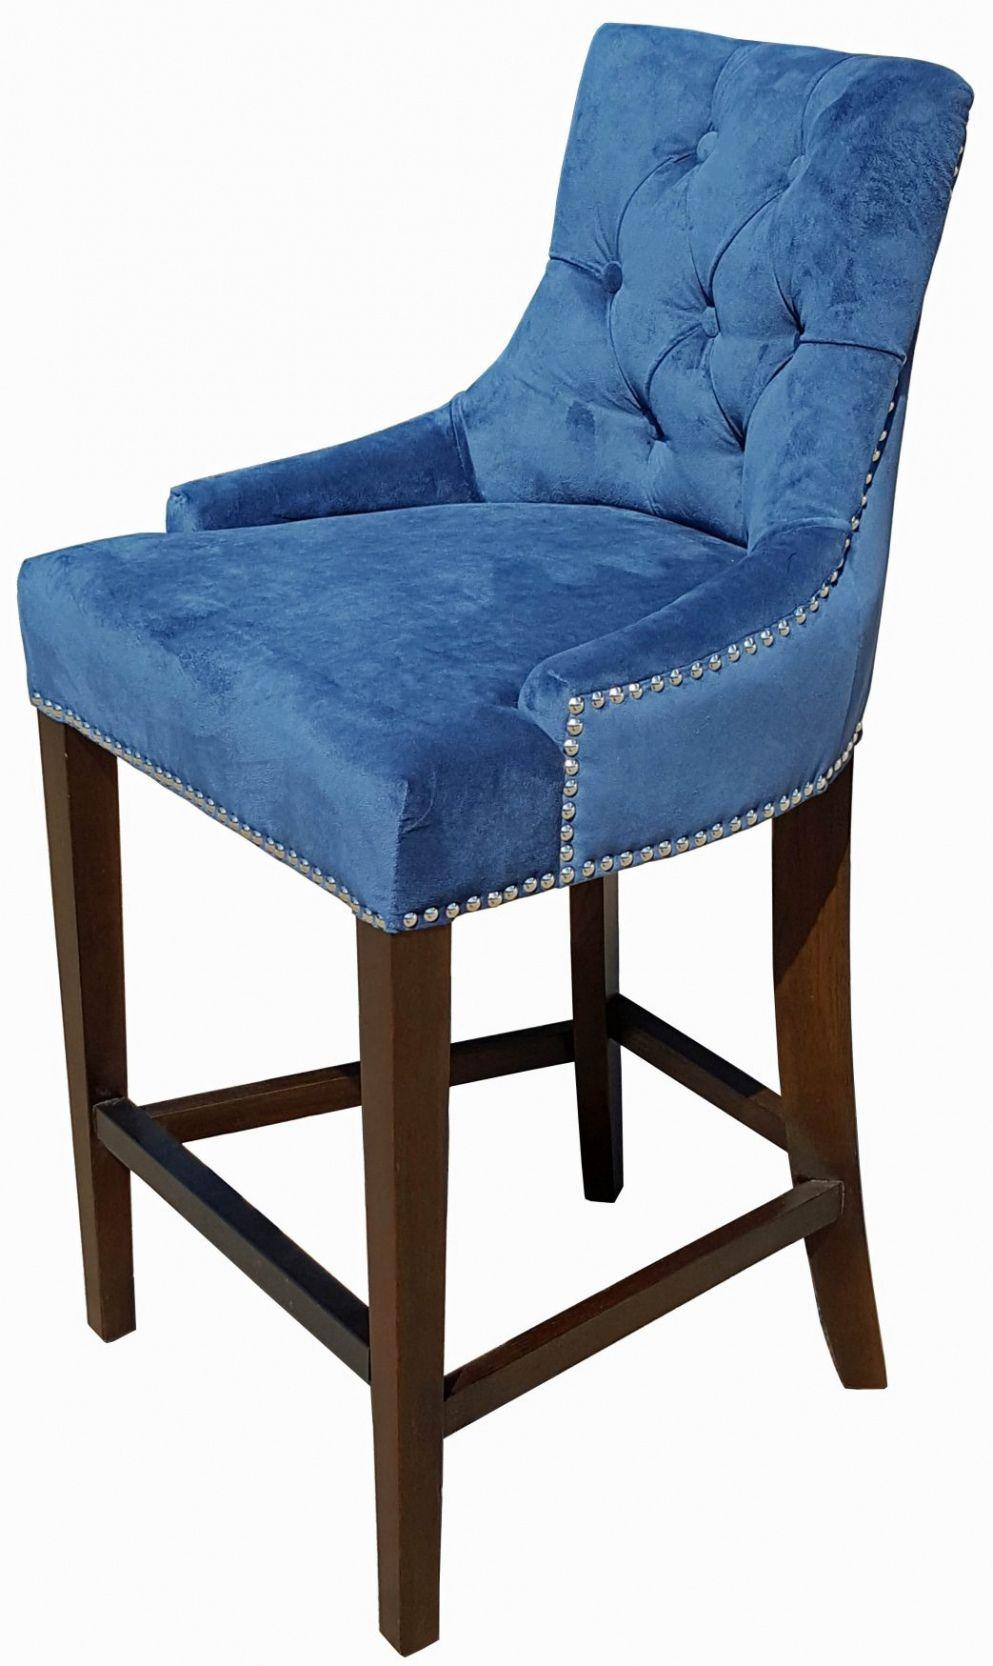 55 Bar Stools Usa Modern Used Furniture Check More At Http